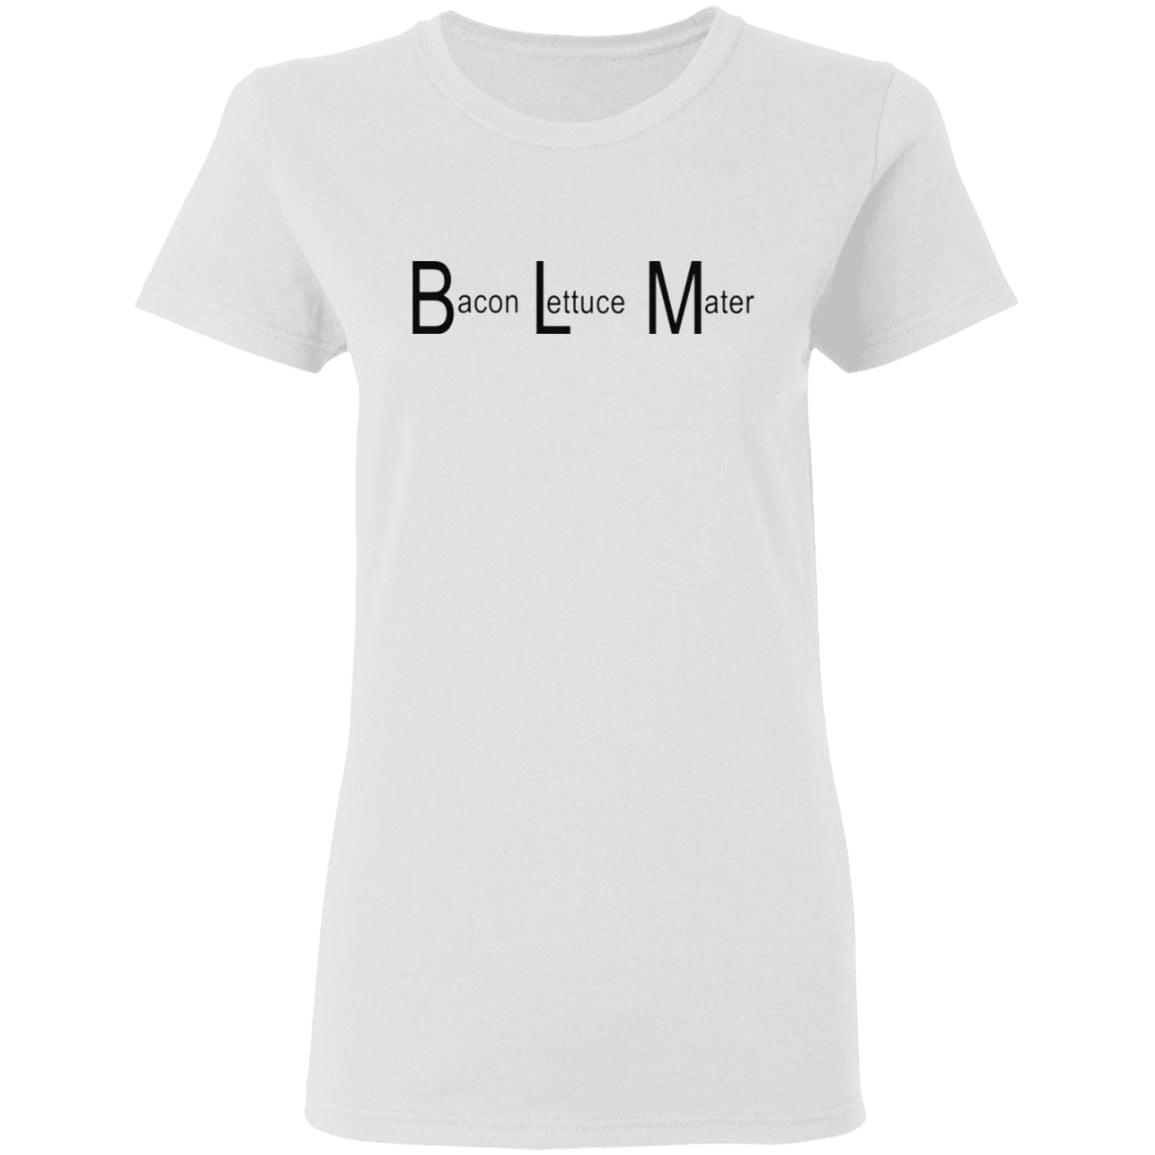 BLM Bacon Lettuce Mater t shirt